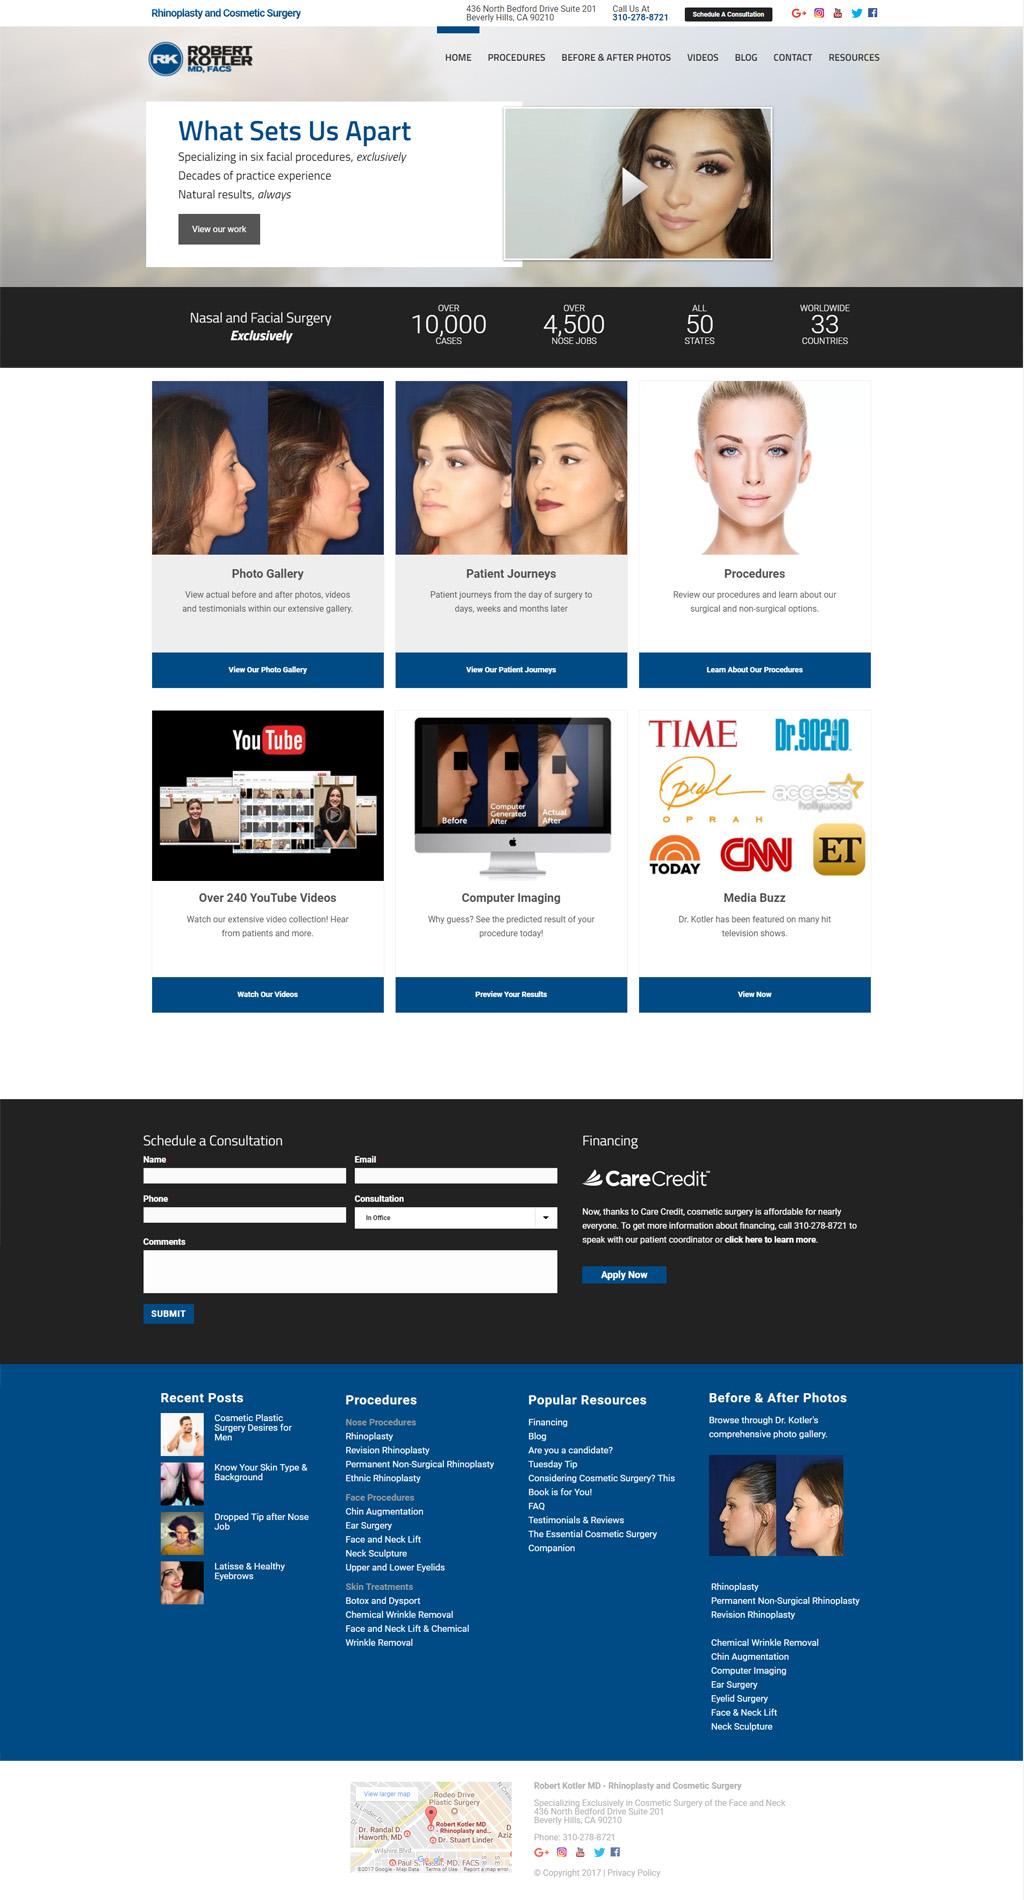 WordPress SEO and Marketing Project